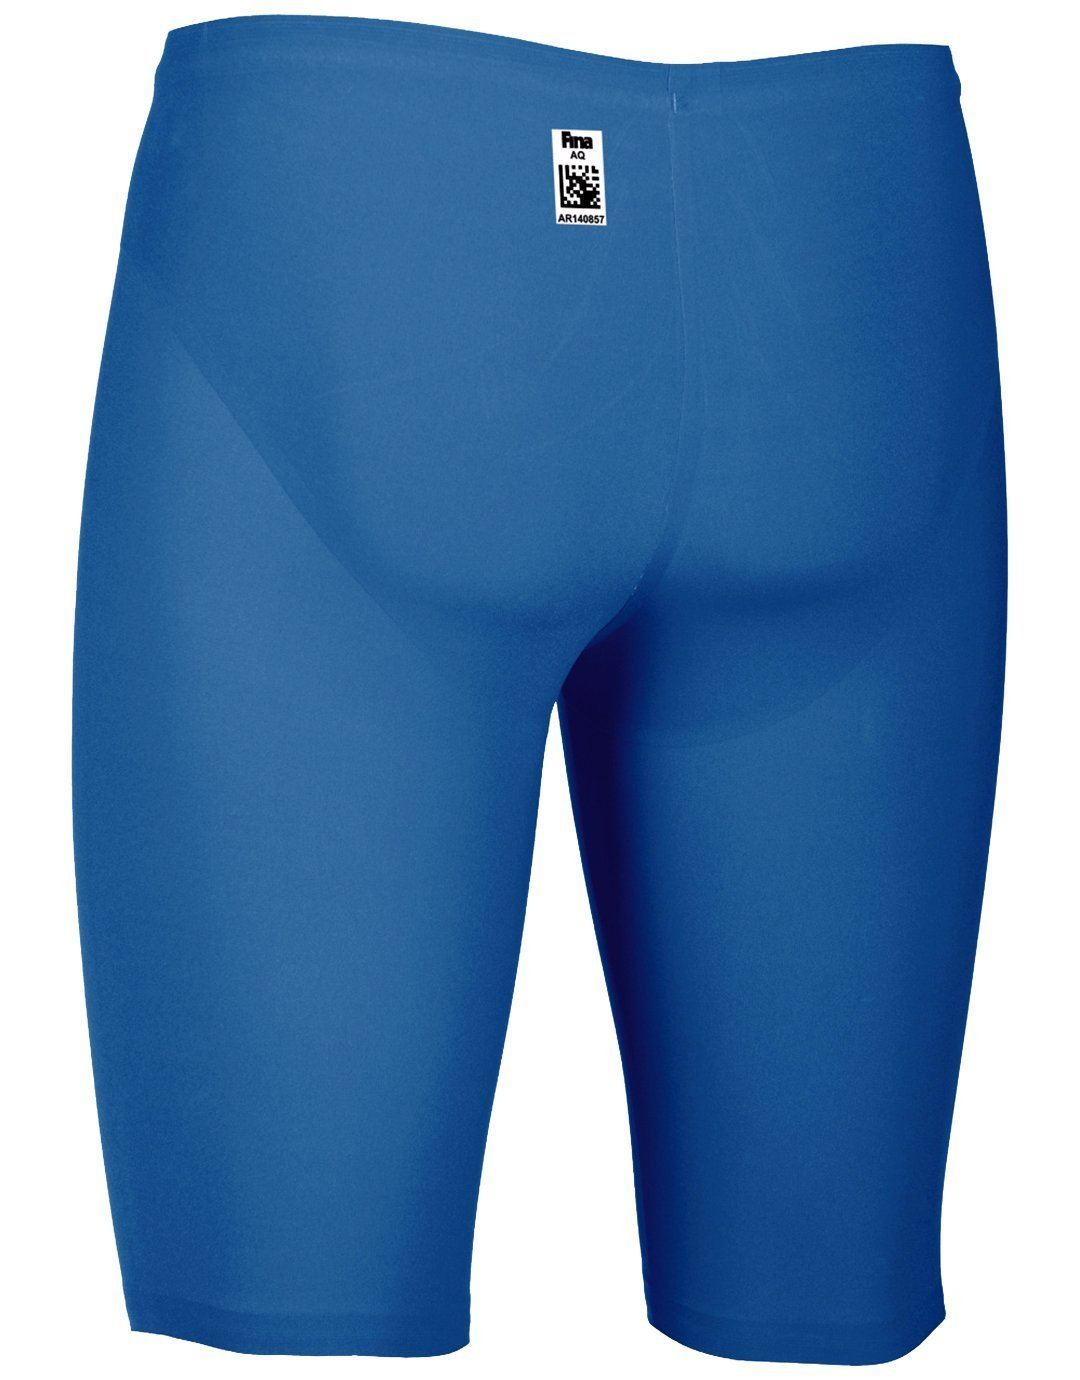 arena Herren St/örsender Powerskin R-evo One Jammer Racing Swimsuit